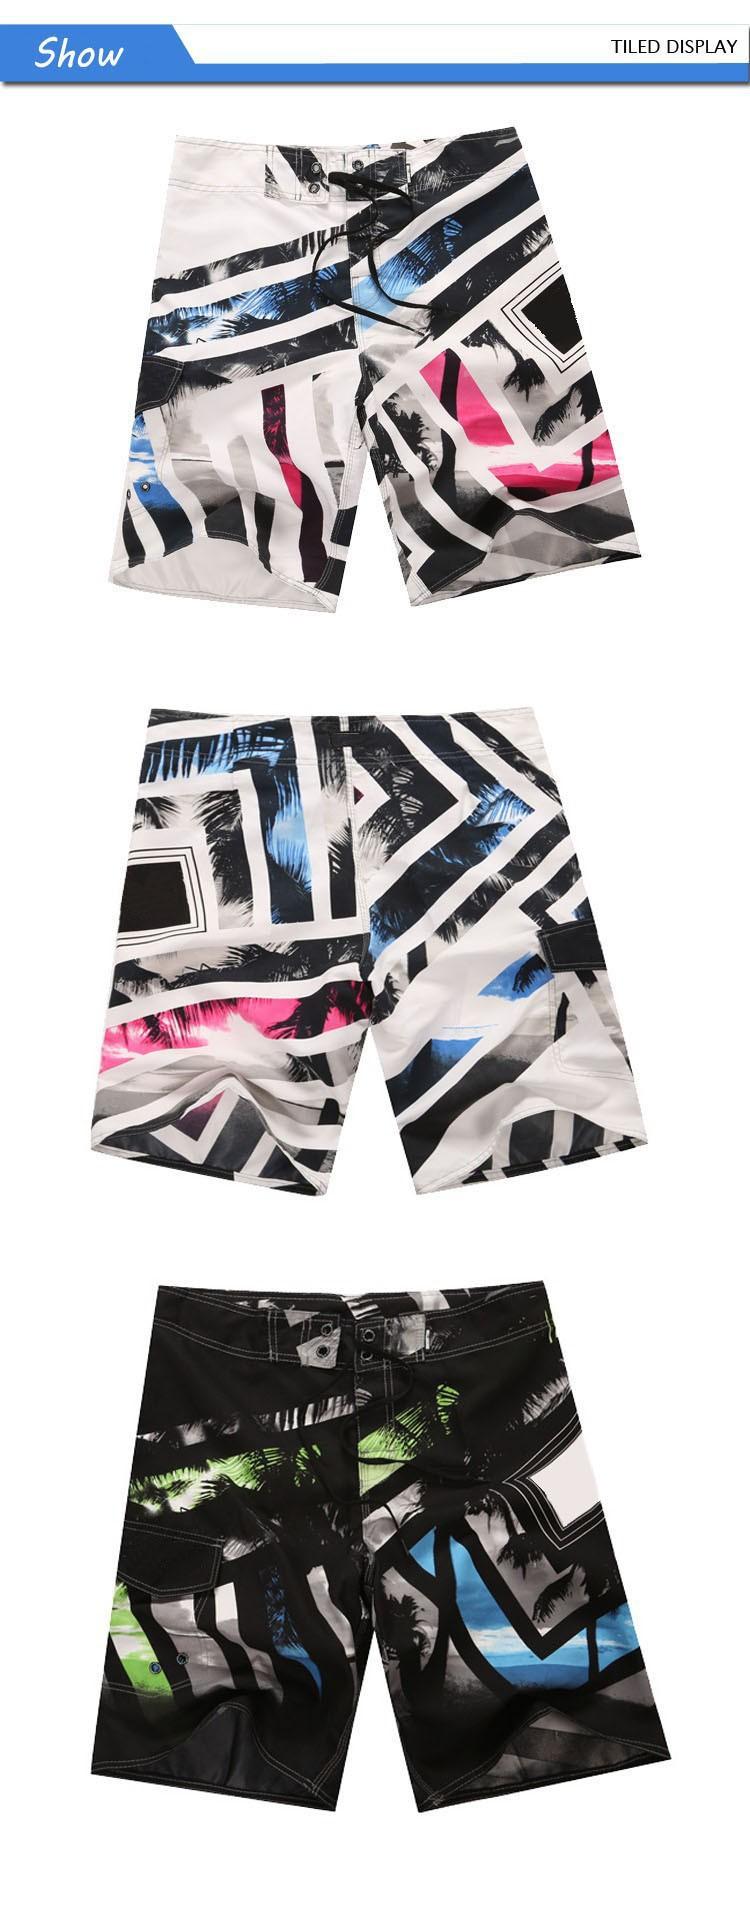 Wholesale brand mens swimwear bermuda masculina beach wear sport male surf <font><b>board</b></font> swim <font><b>shorts</b></font> men boardshorts plus size 30-38